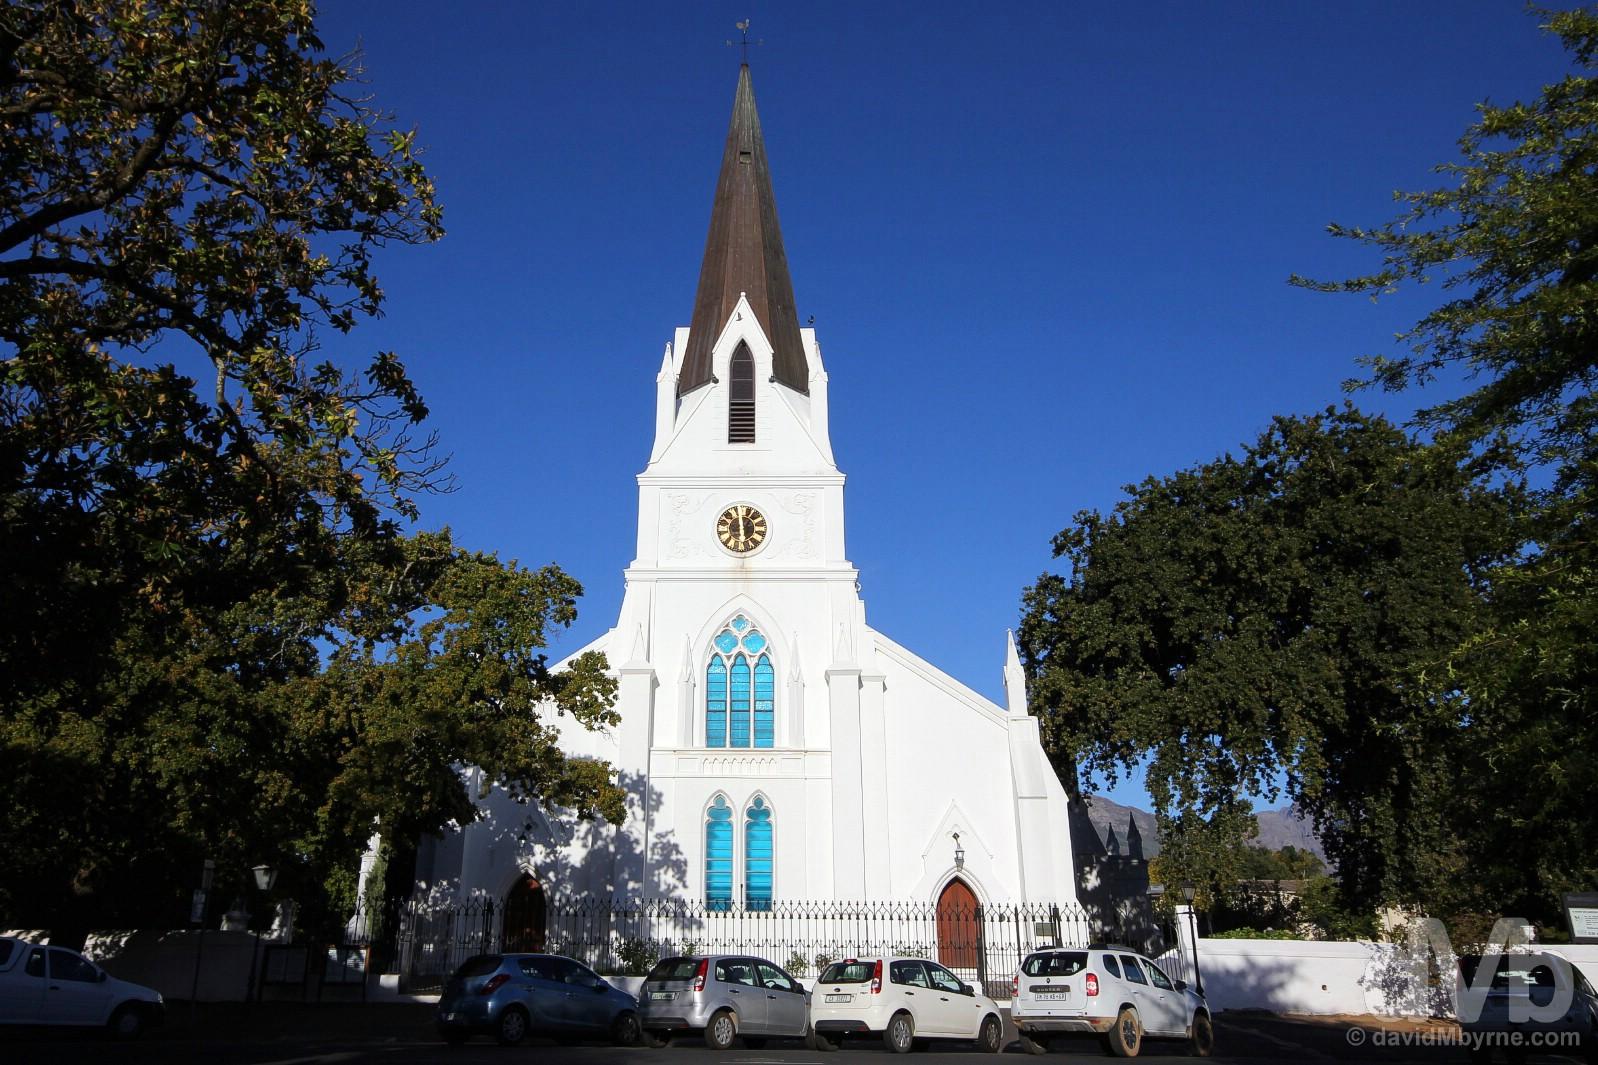 Moedergemeente, Drostdy Road, Stellenbosch, Western Cape, South Africa. February 18, 2017.